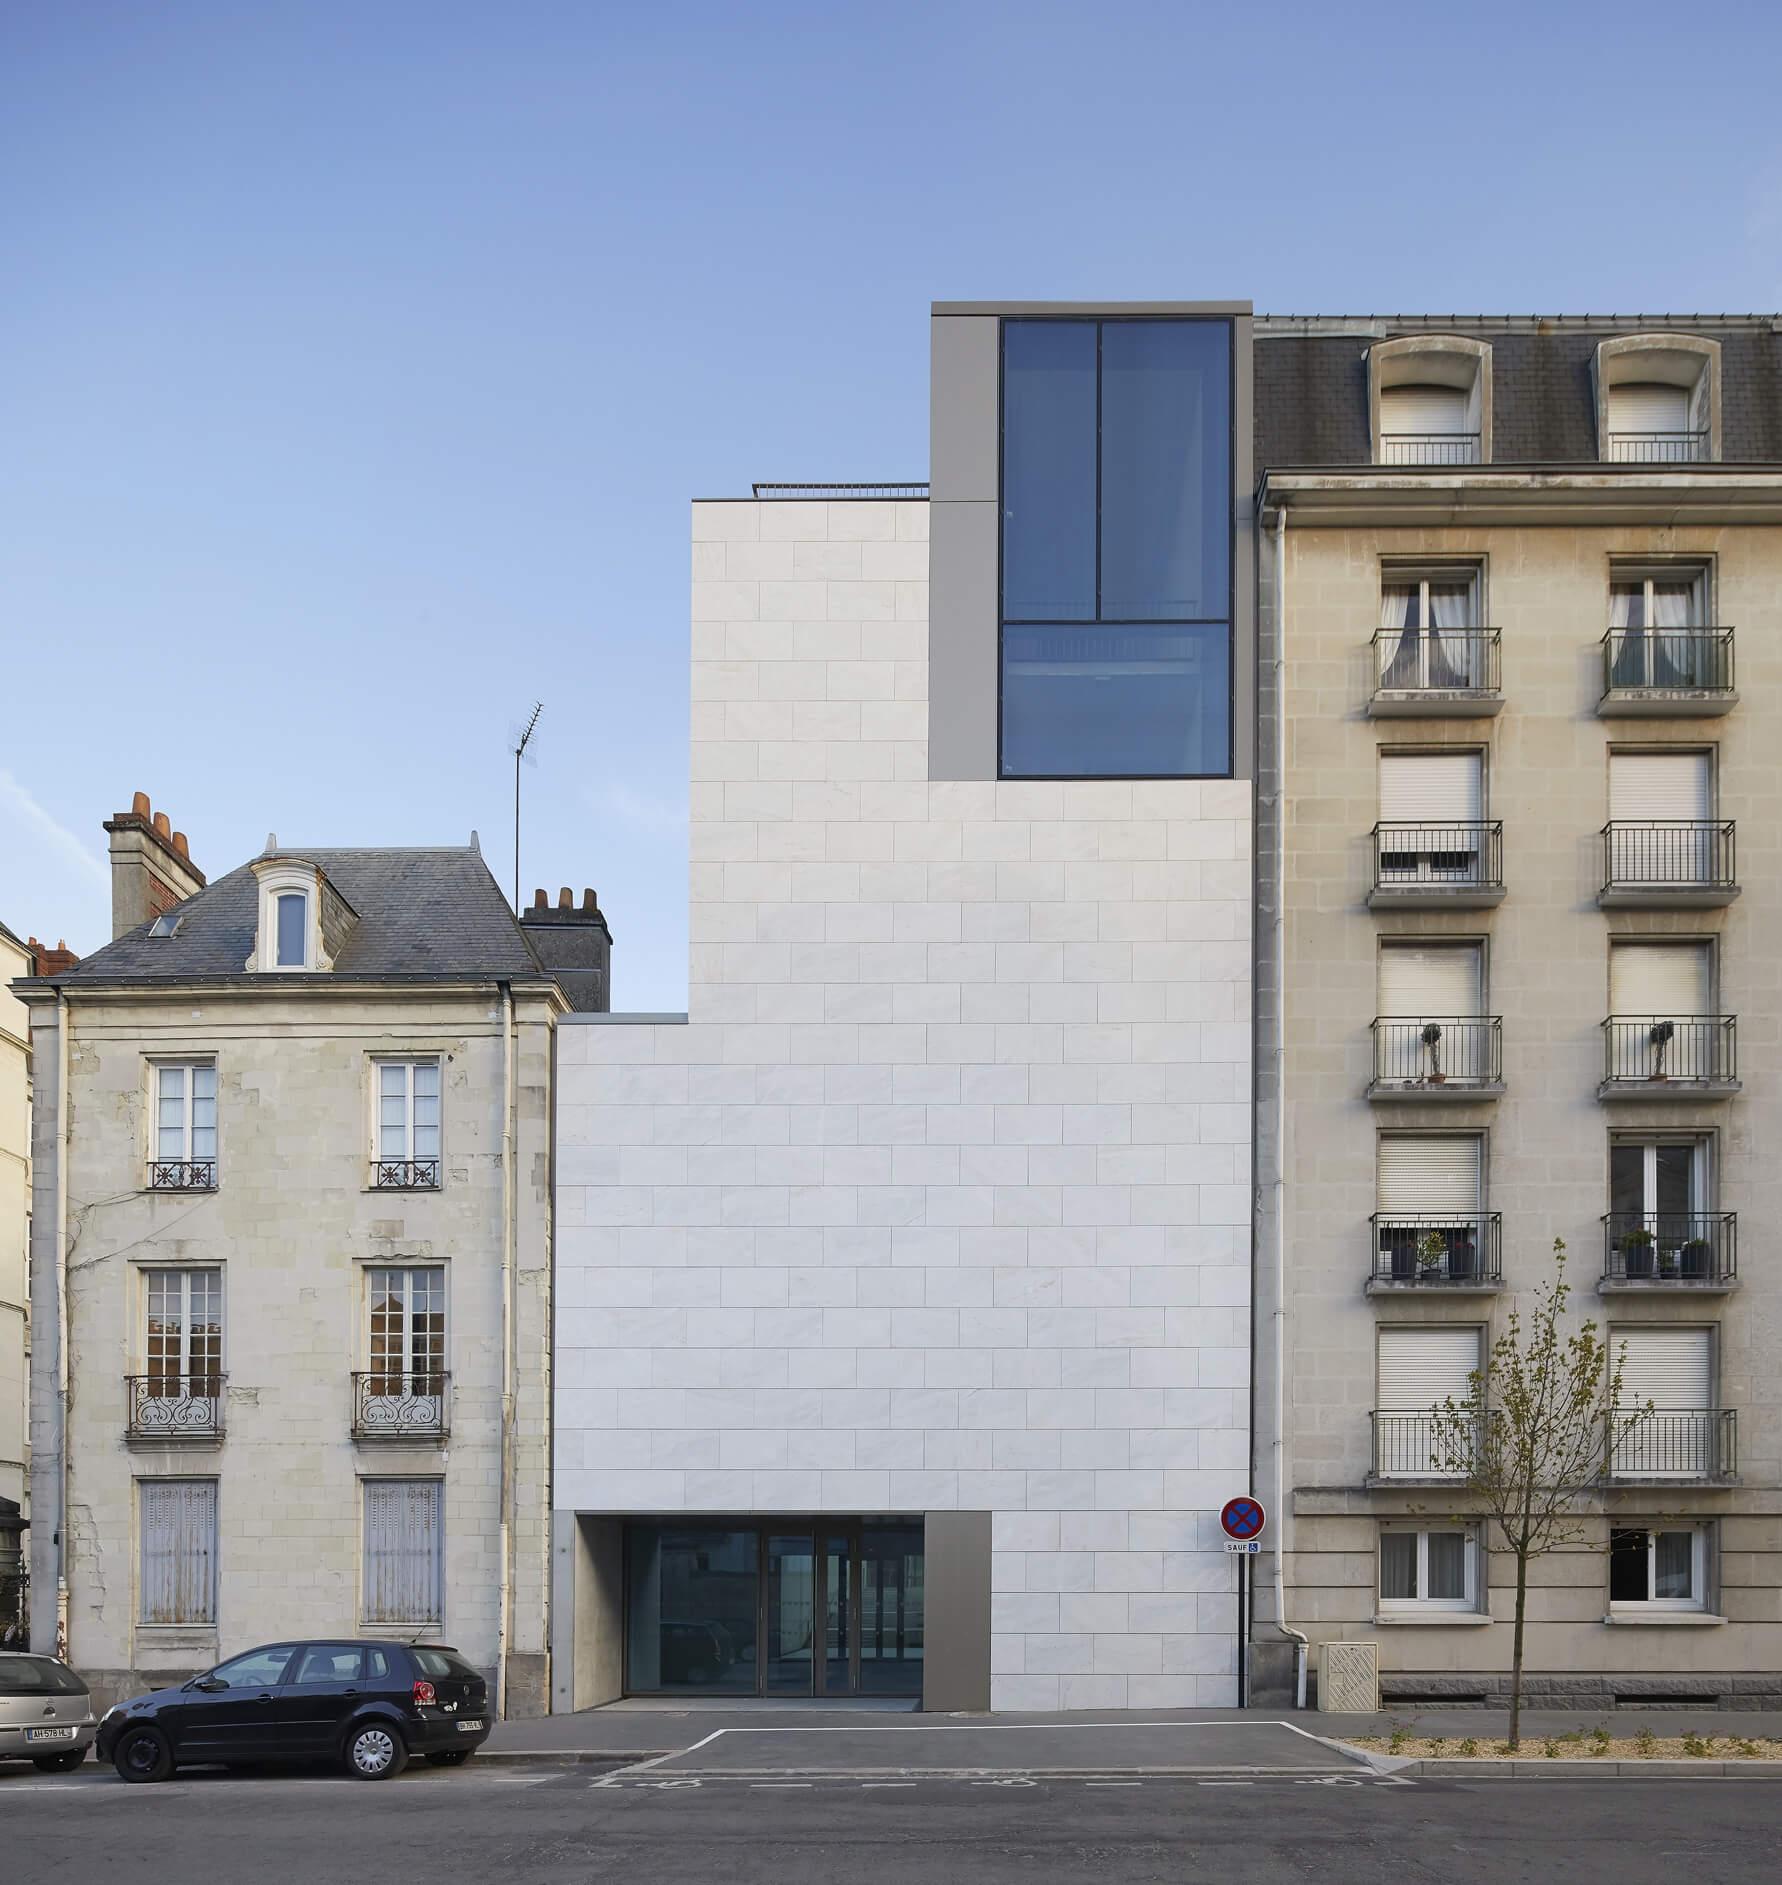 Stantons Williams. Museo de Arte de Nantes. Francia